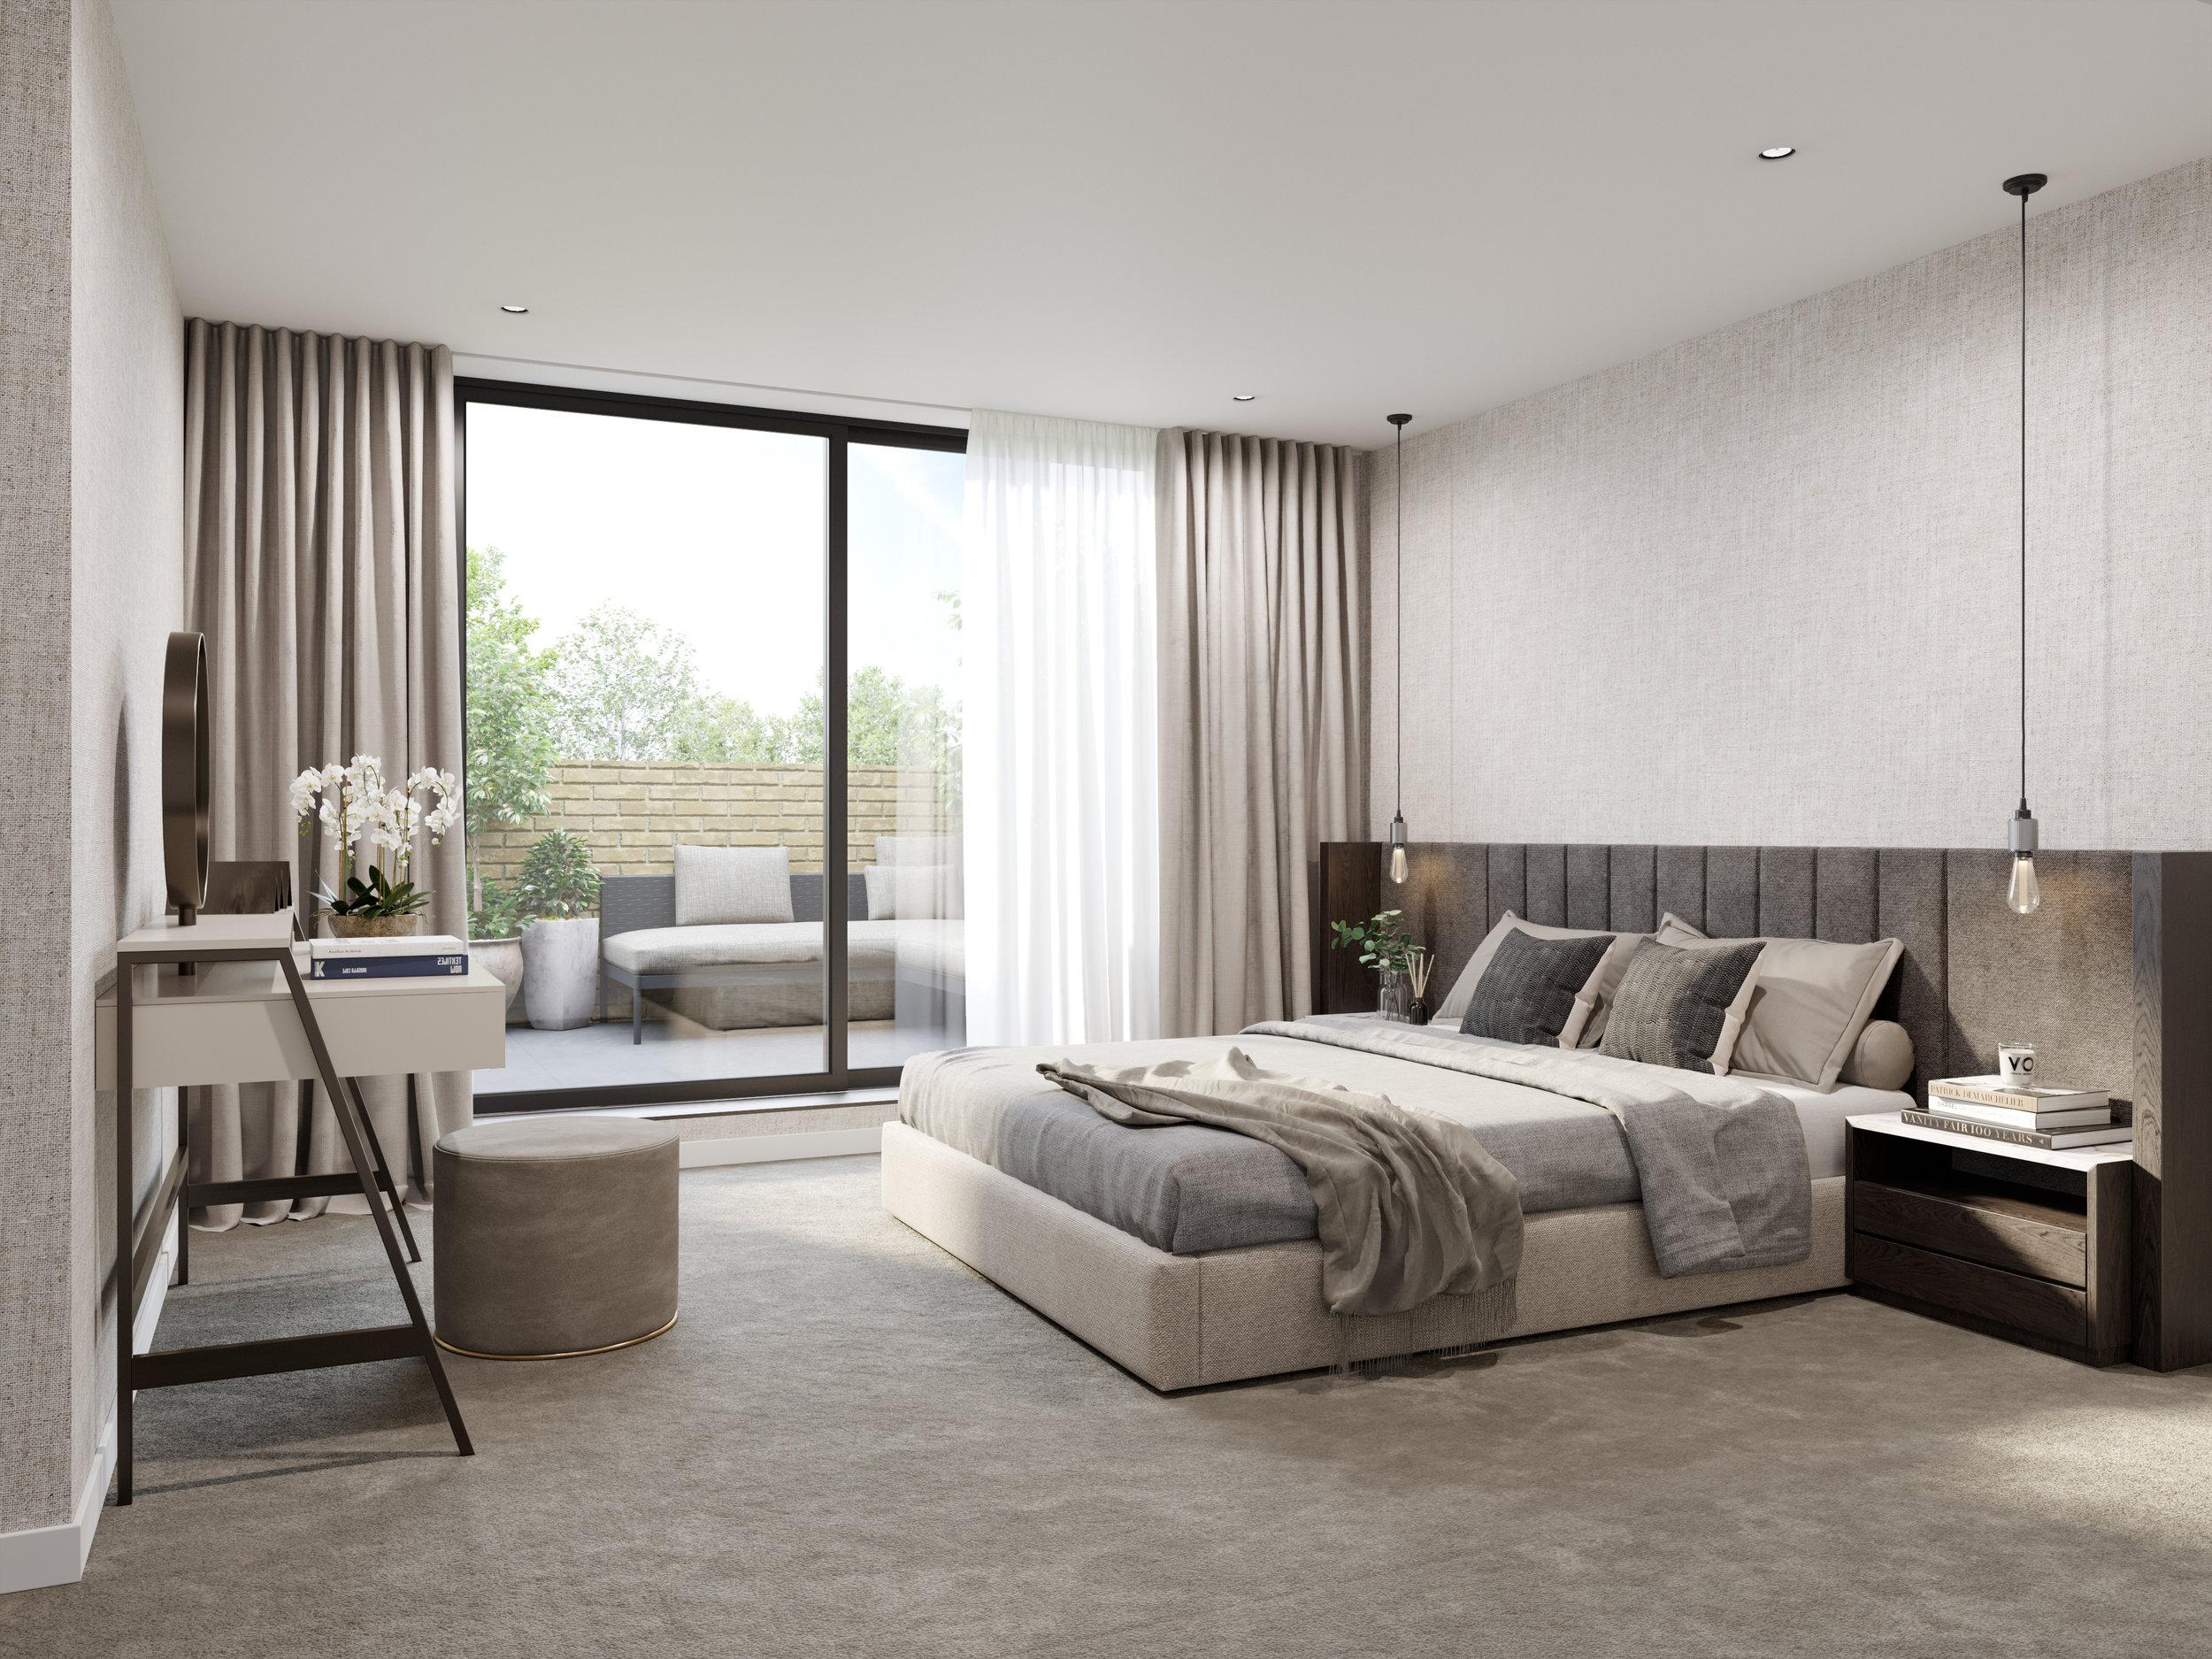 Bedroom_01_6.jpg